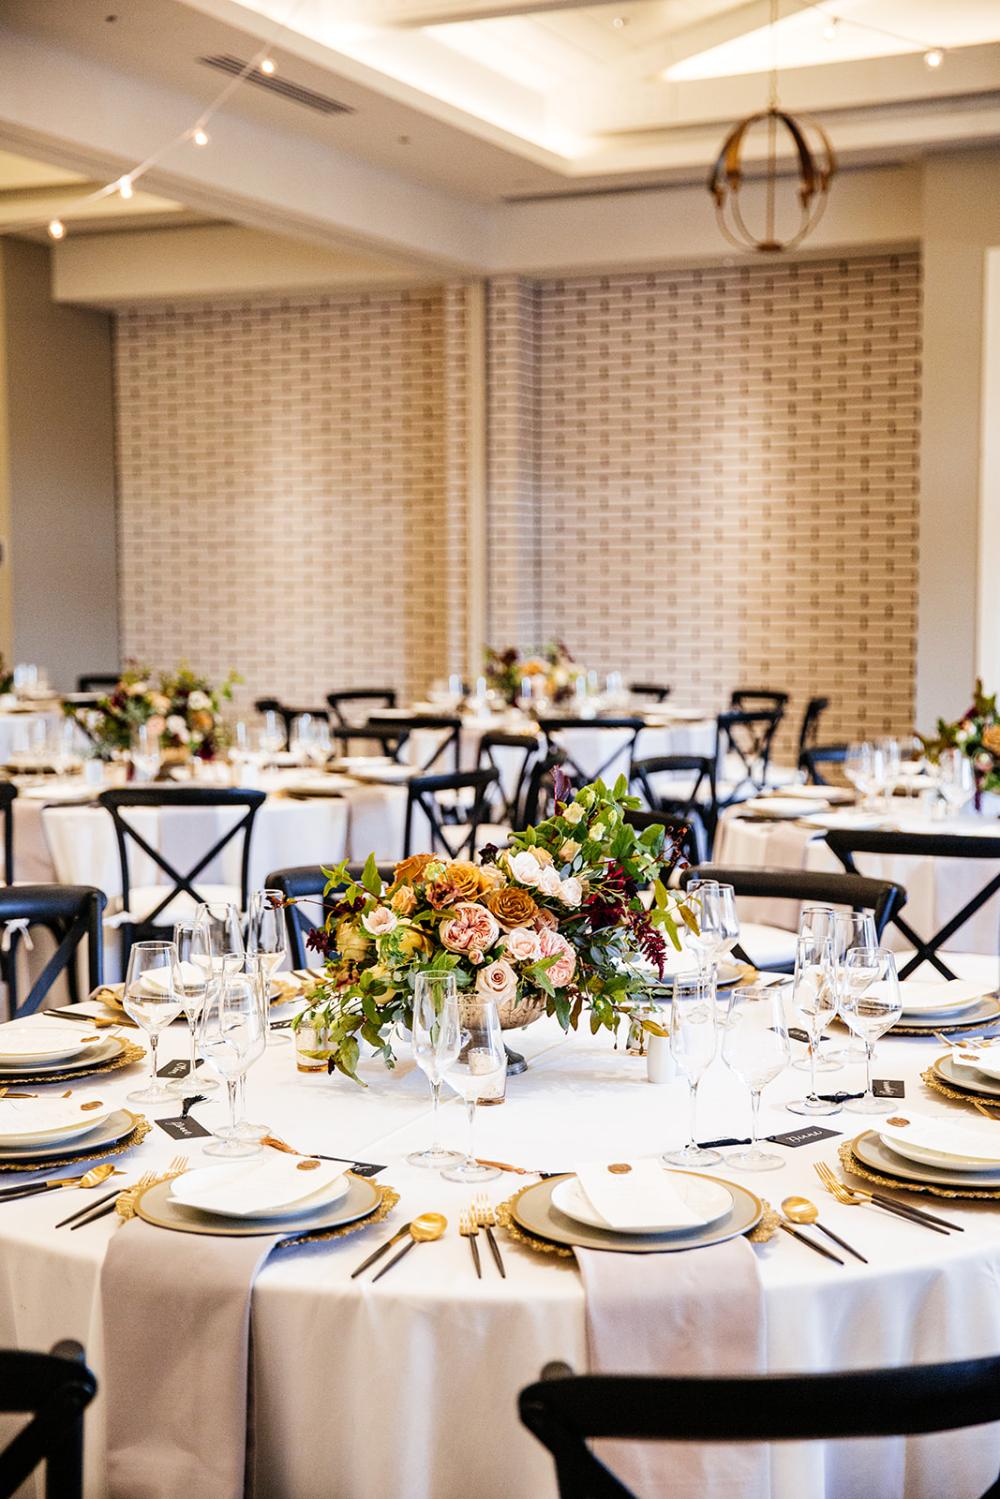 Lido House Pure Lavish Events Wedding Decor Wedding Details So Cal Wedding Orange County Wedding In 2020 Marble House Indoor Wedding Marble Tables Living Room